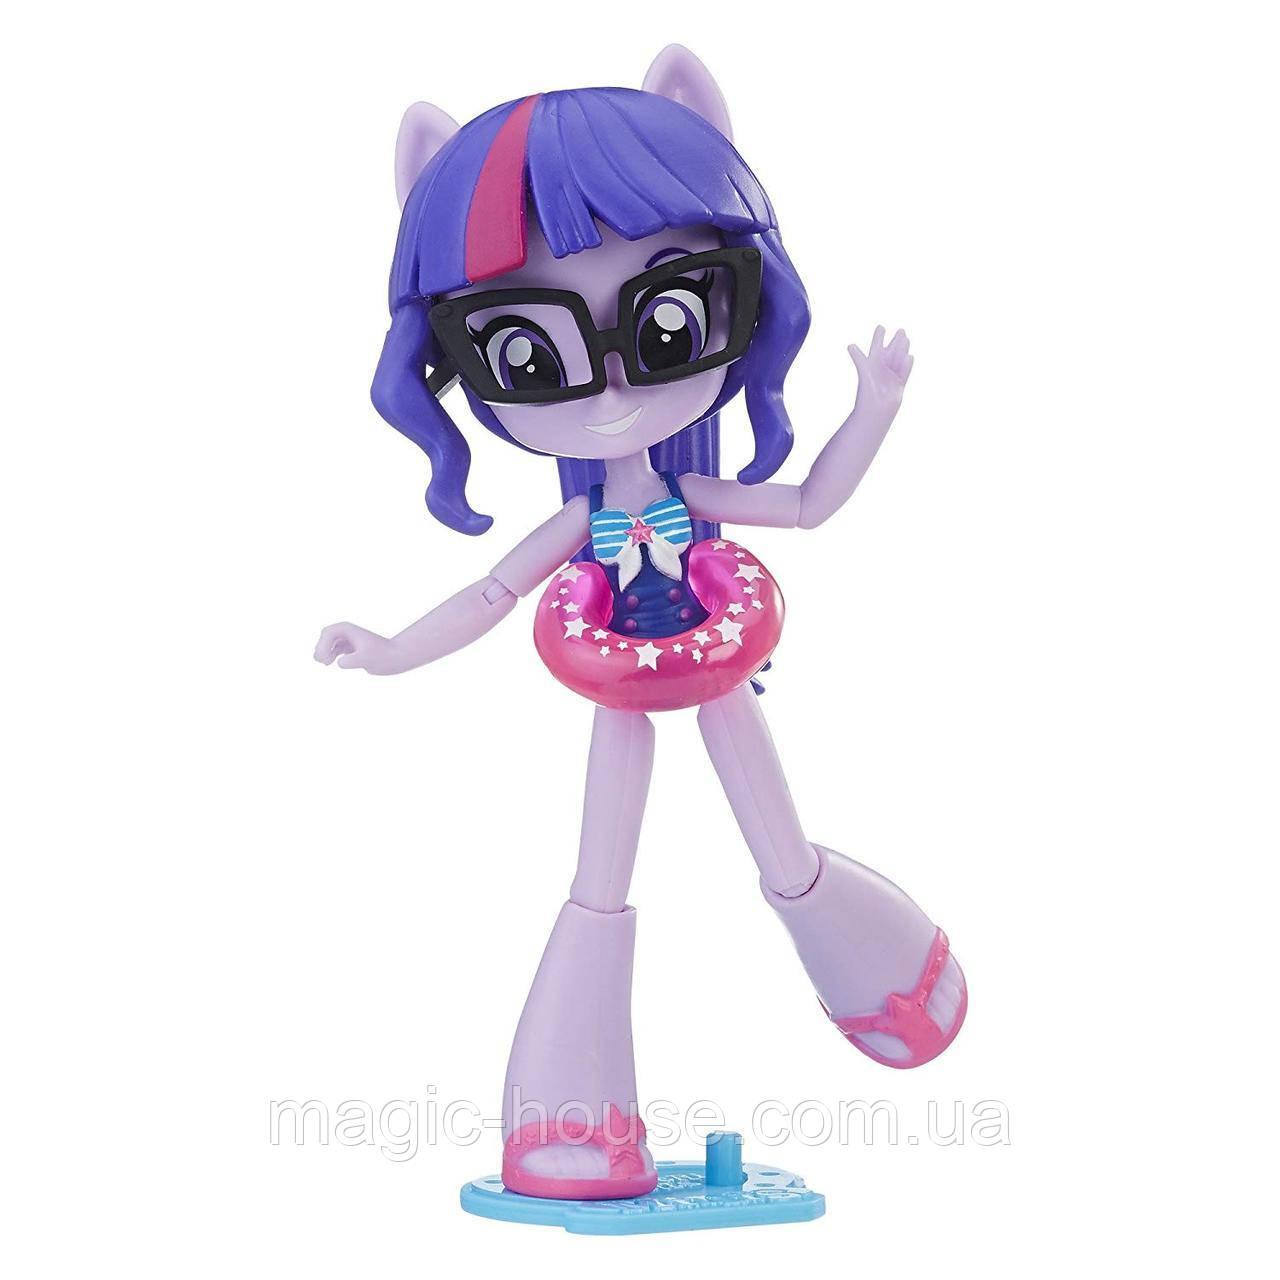 Май Лител Пони Твайлайт Спаркл Пляж My Little Pony Equestria Girls Beach Collection Twilight Sparkle